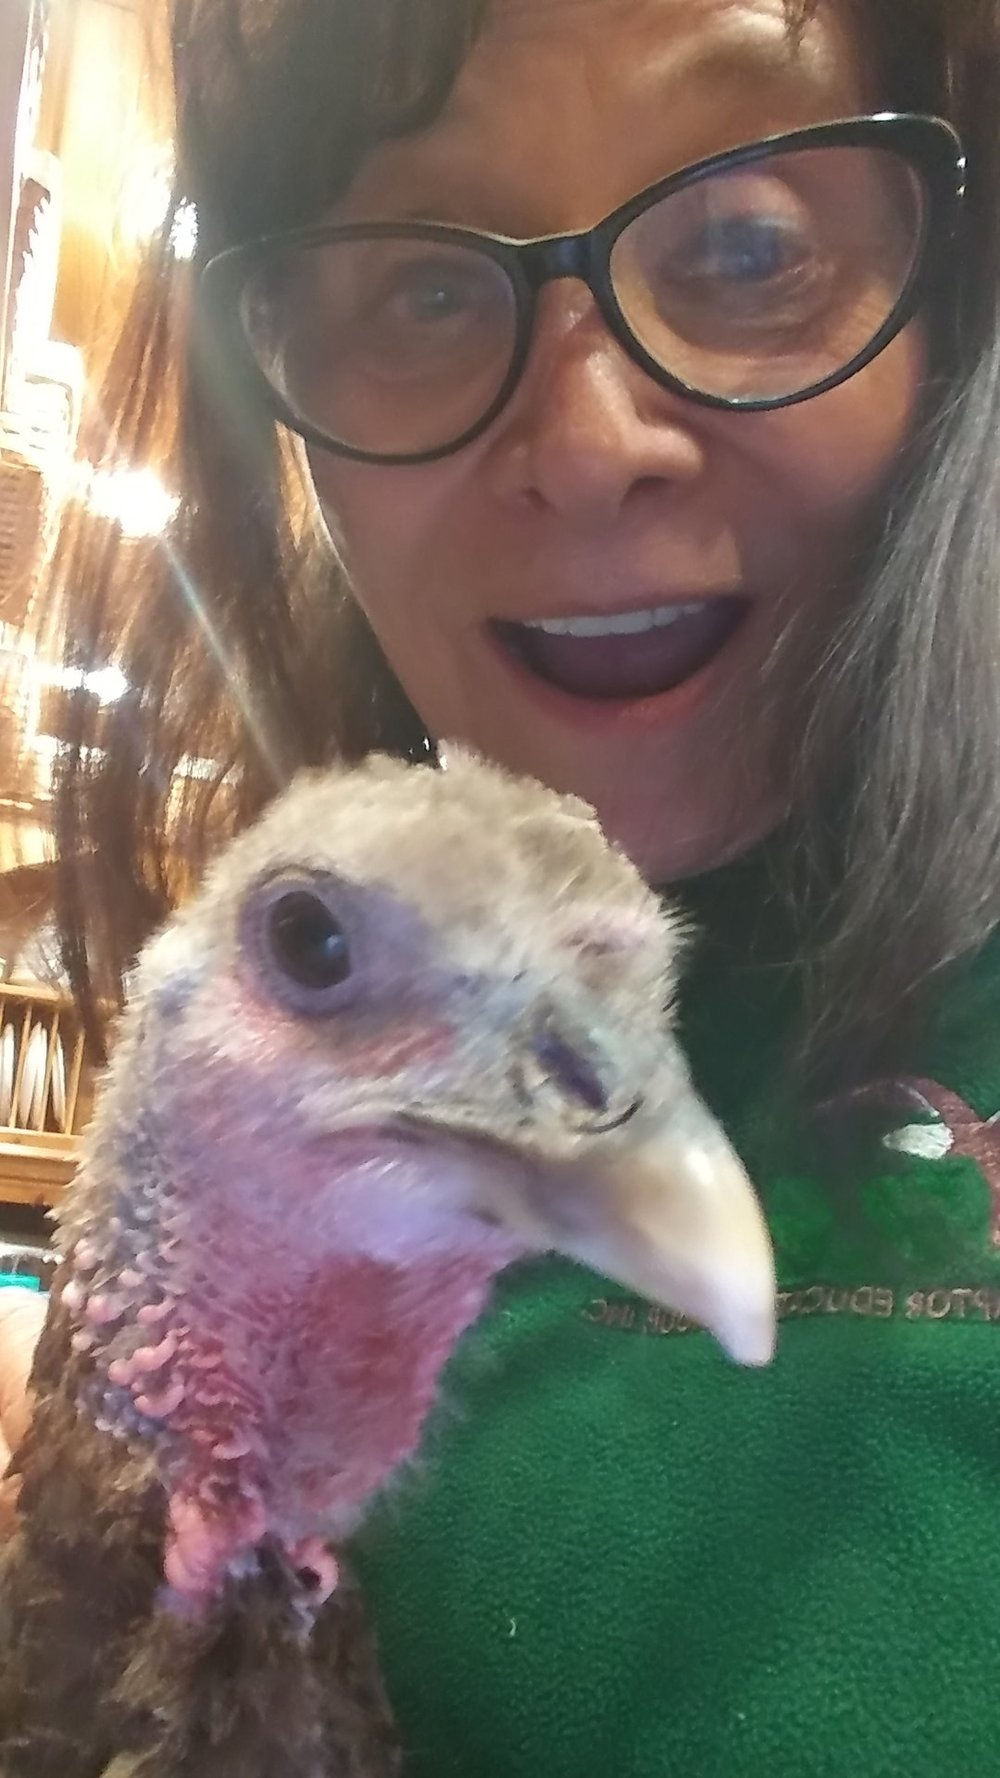 Turkey selfie!